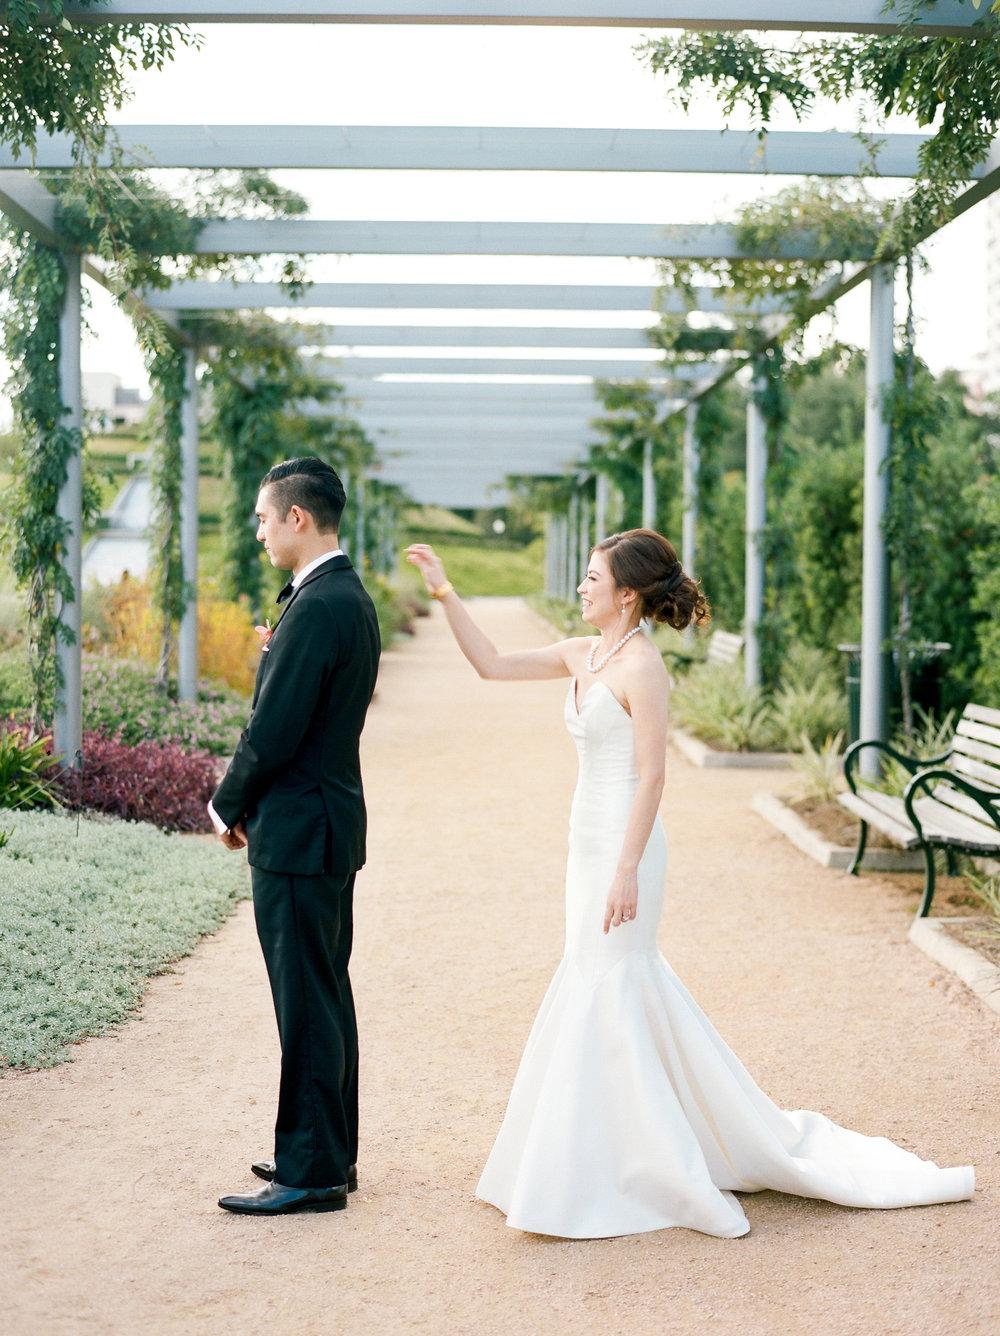 The-Knot-Texas-Magazine-Wedding-Top-Best-Houston-Wedding-Photographer-Fine-Art-Film-Dana-Fernandez-Photography-115.jpg